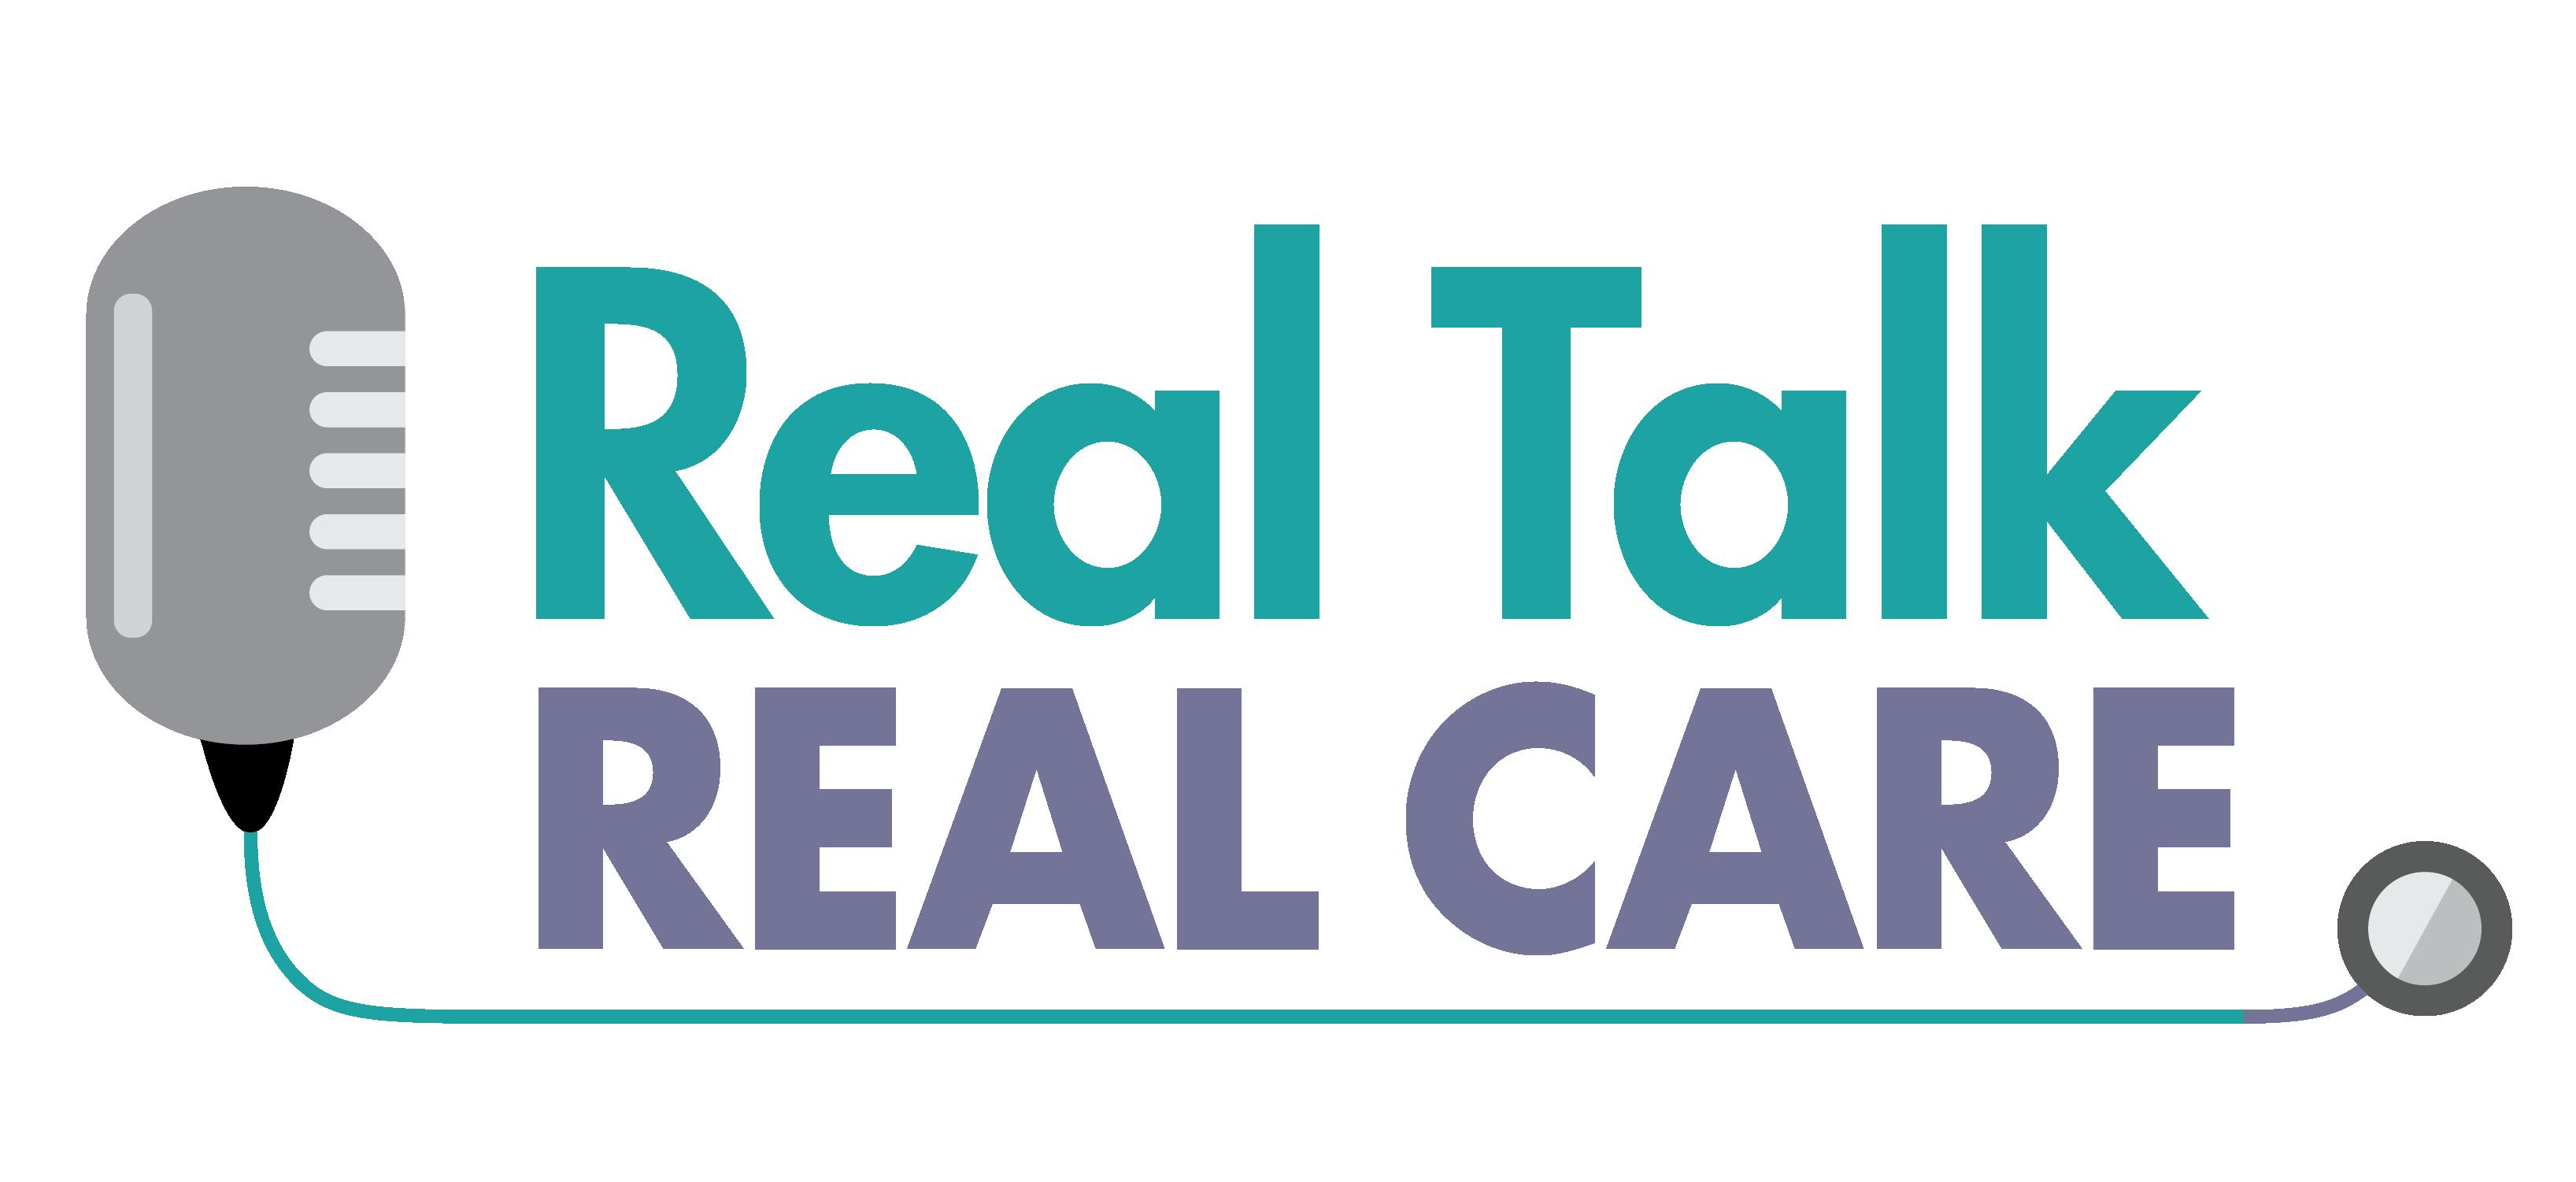 Accent Care logo